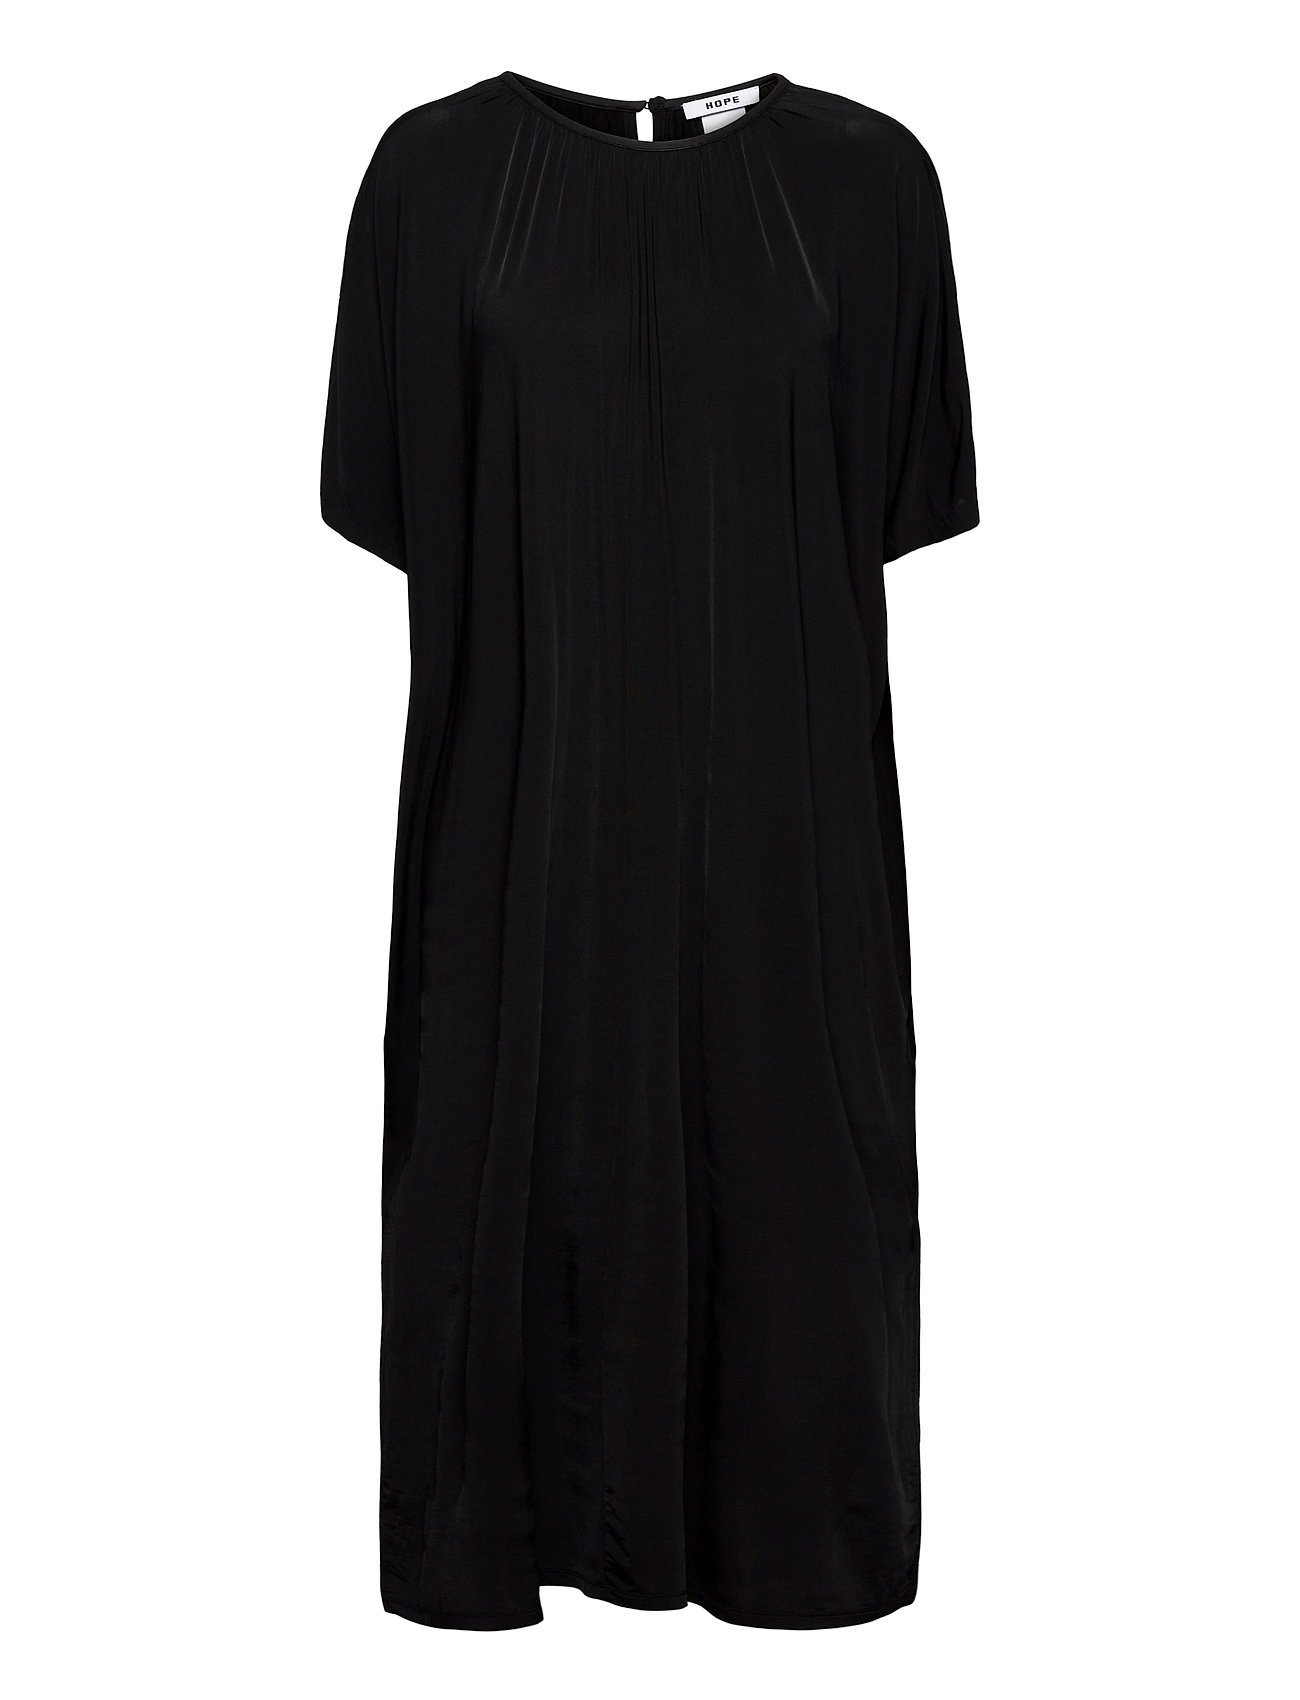 Image of Sense Dress Maxikjole Festkjole Sort Hope (3447796501)